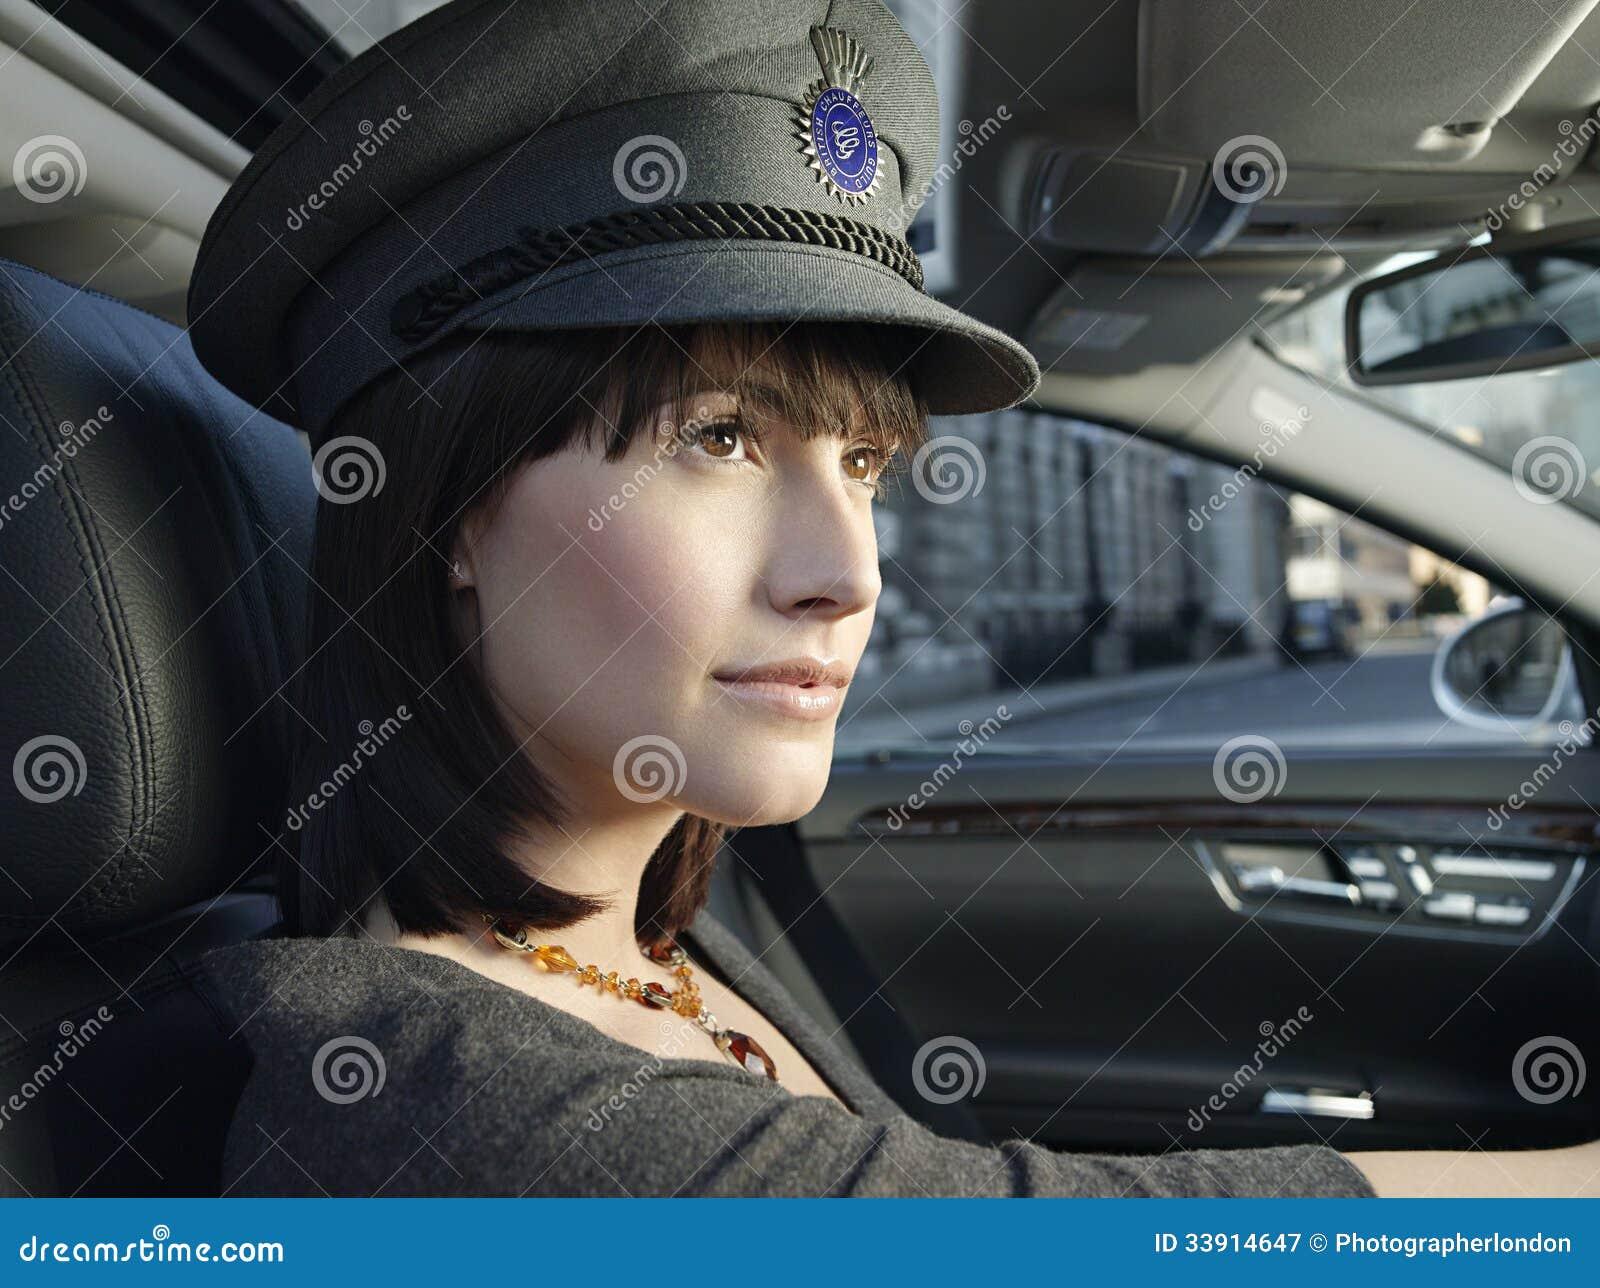 Female Chauffeur Driving A Car Royalty Free Stock